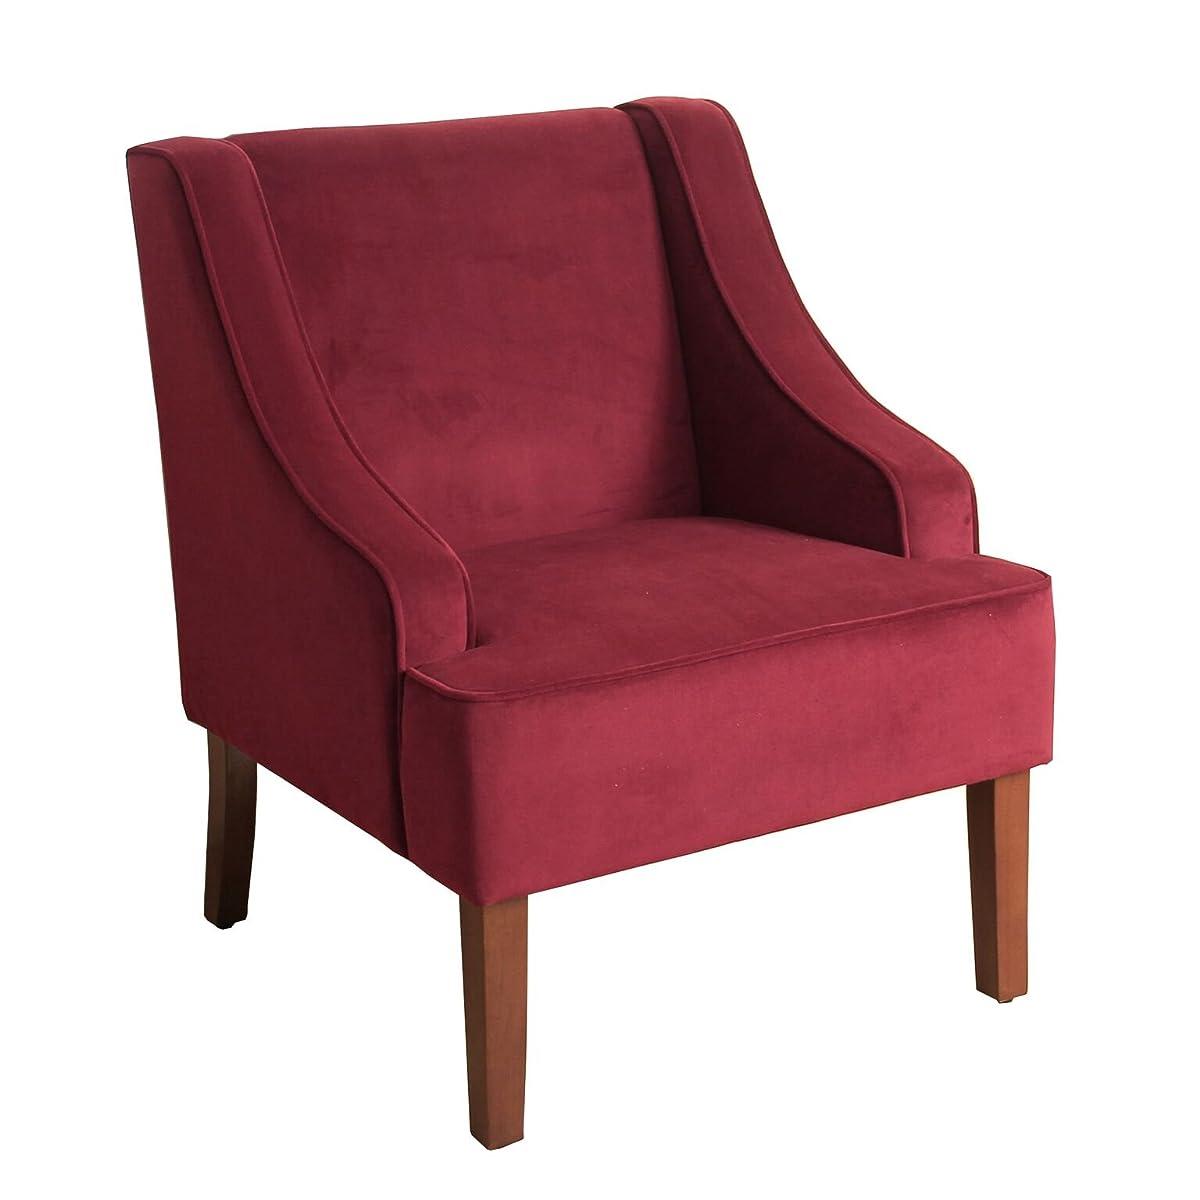 HomePop K6499-B119 Swoop Arm Accent Chair, Medium, Burgundy